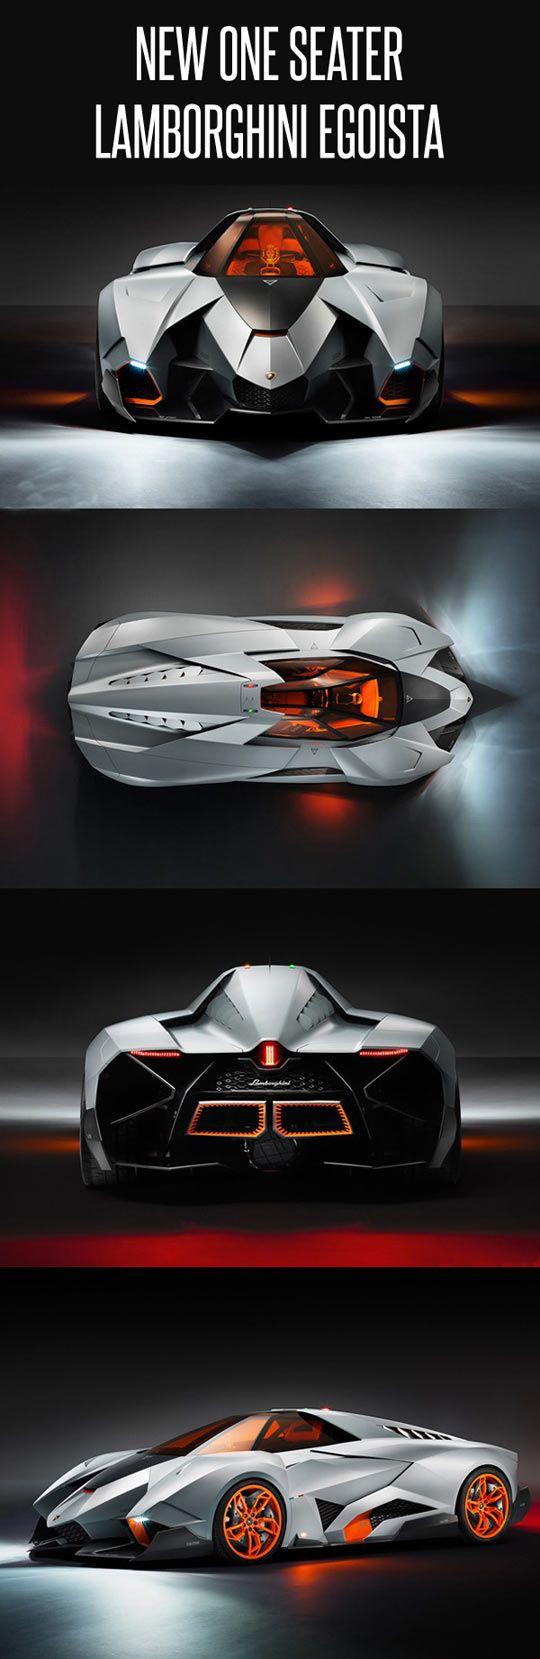 The dream car every guy with good taste wants…